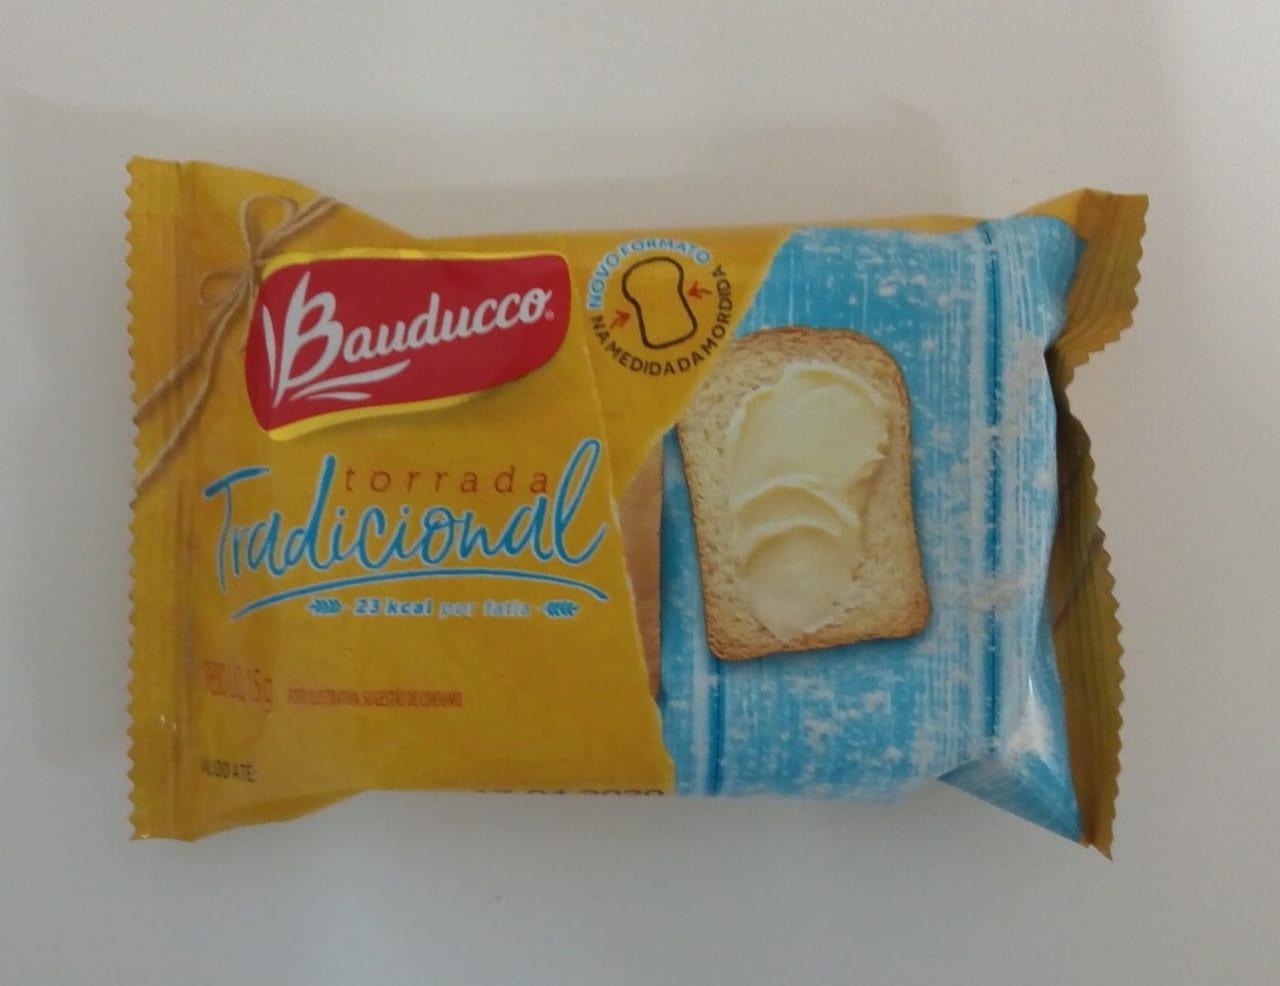 CAIXA DE TORRADA BAUDUCCO